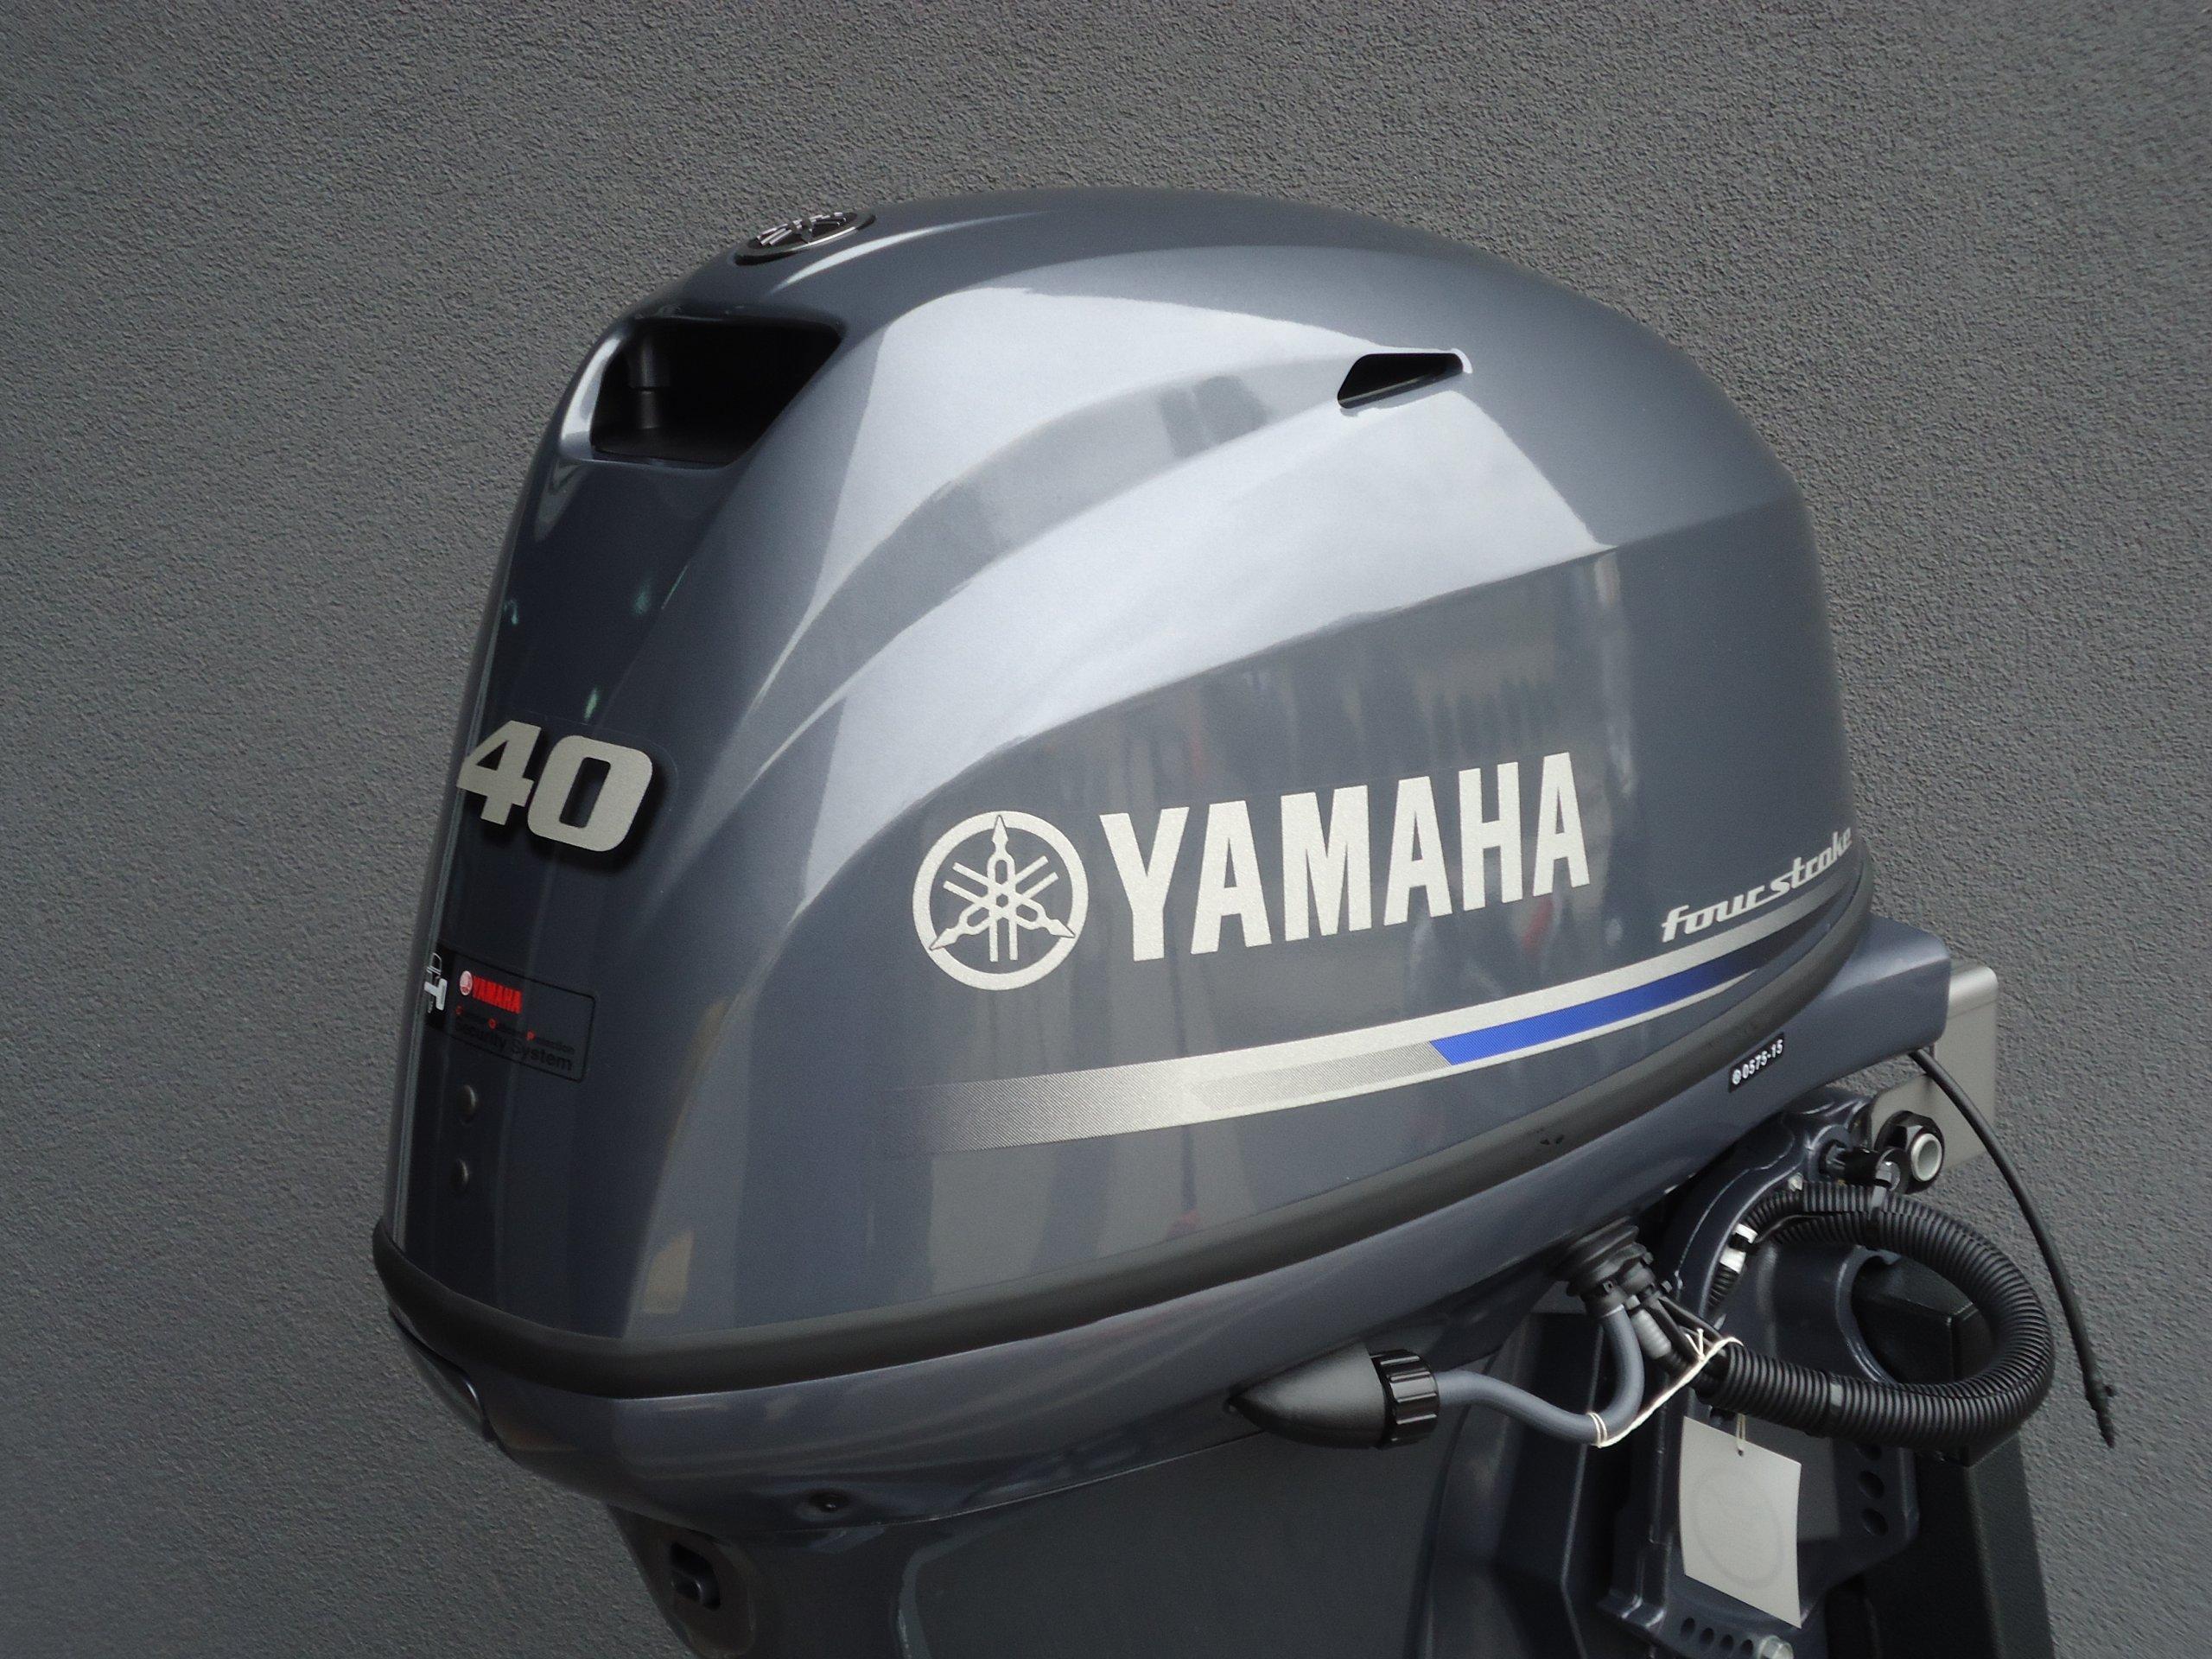 Lodný MOTOR YAMAHA F40 FETL PŁOCK HOT DEAL